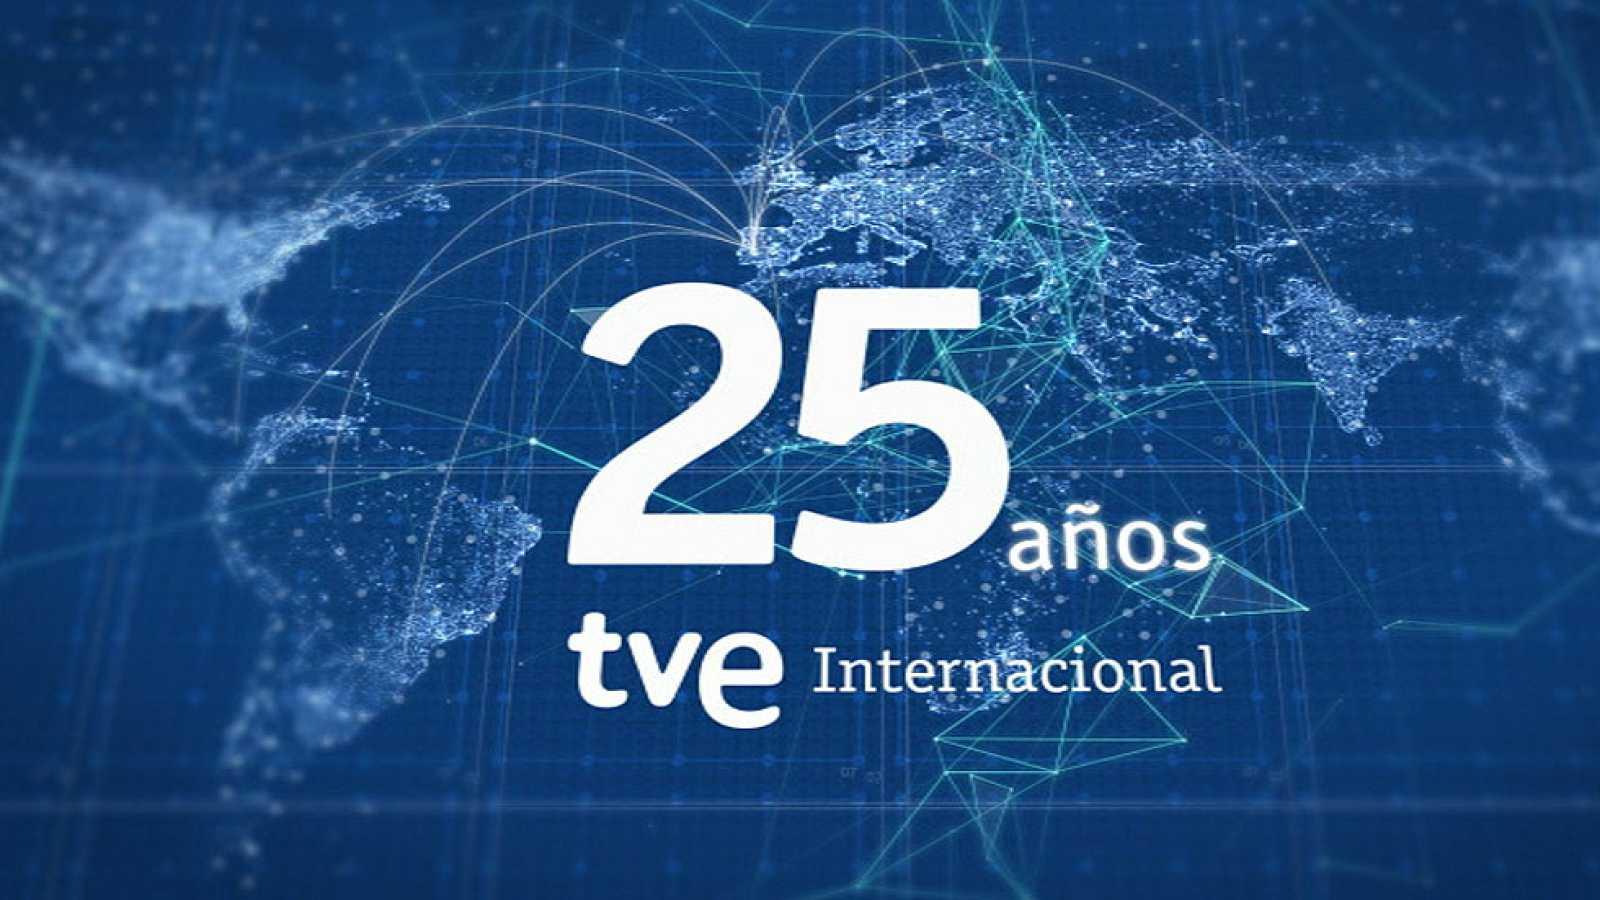 TVE Internacional cumple 25 años